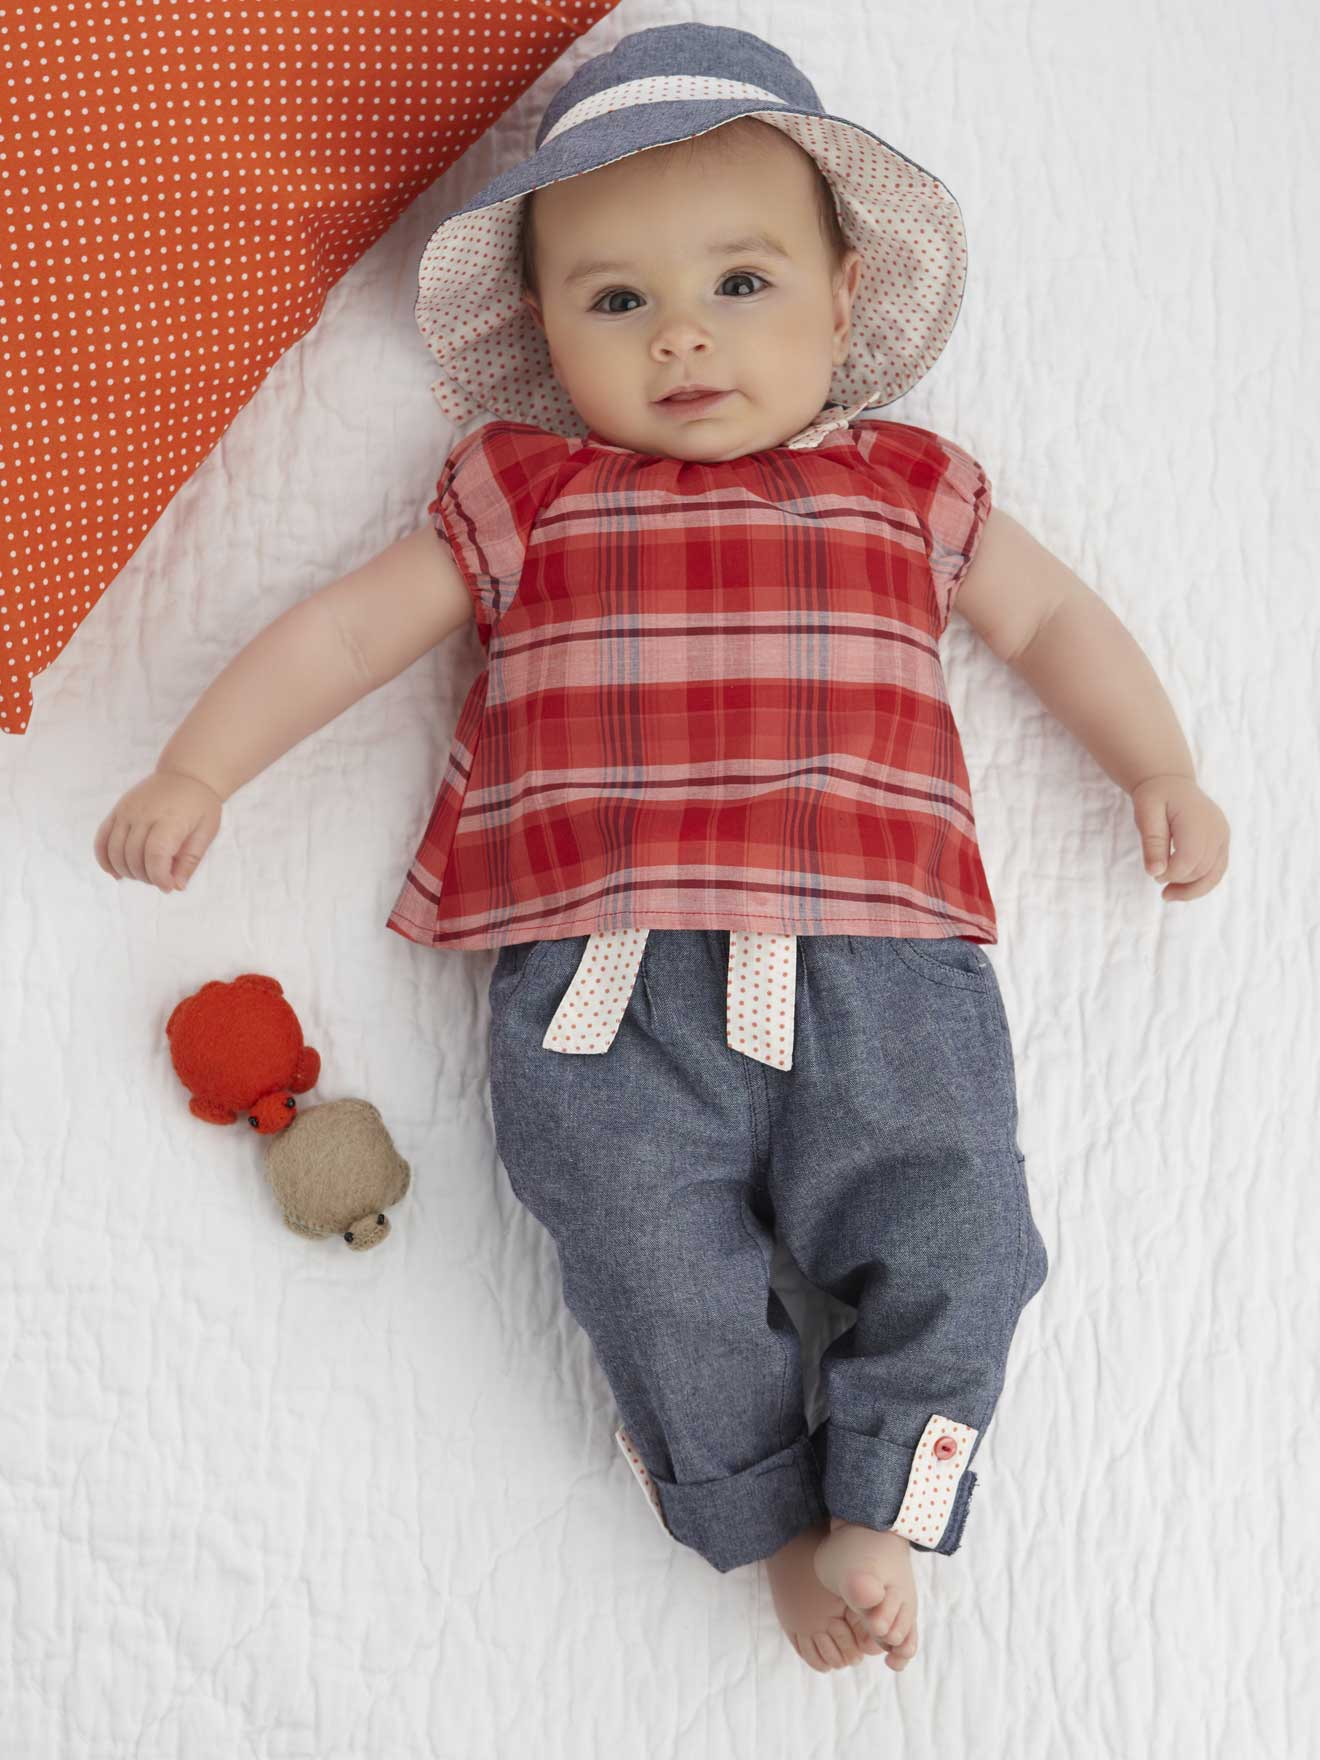 44502dcc25e3f ملابس اطفال ماركات